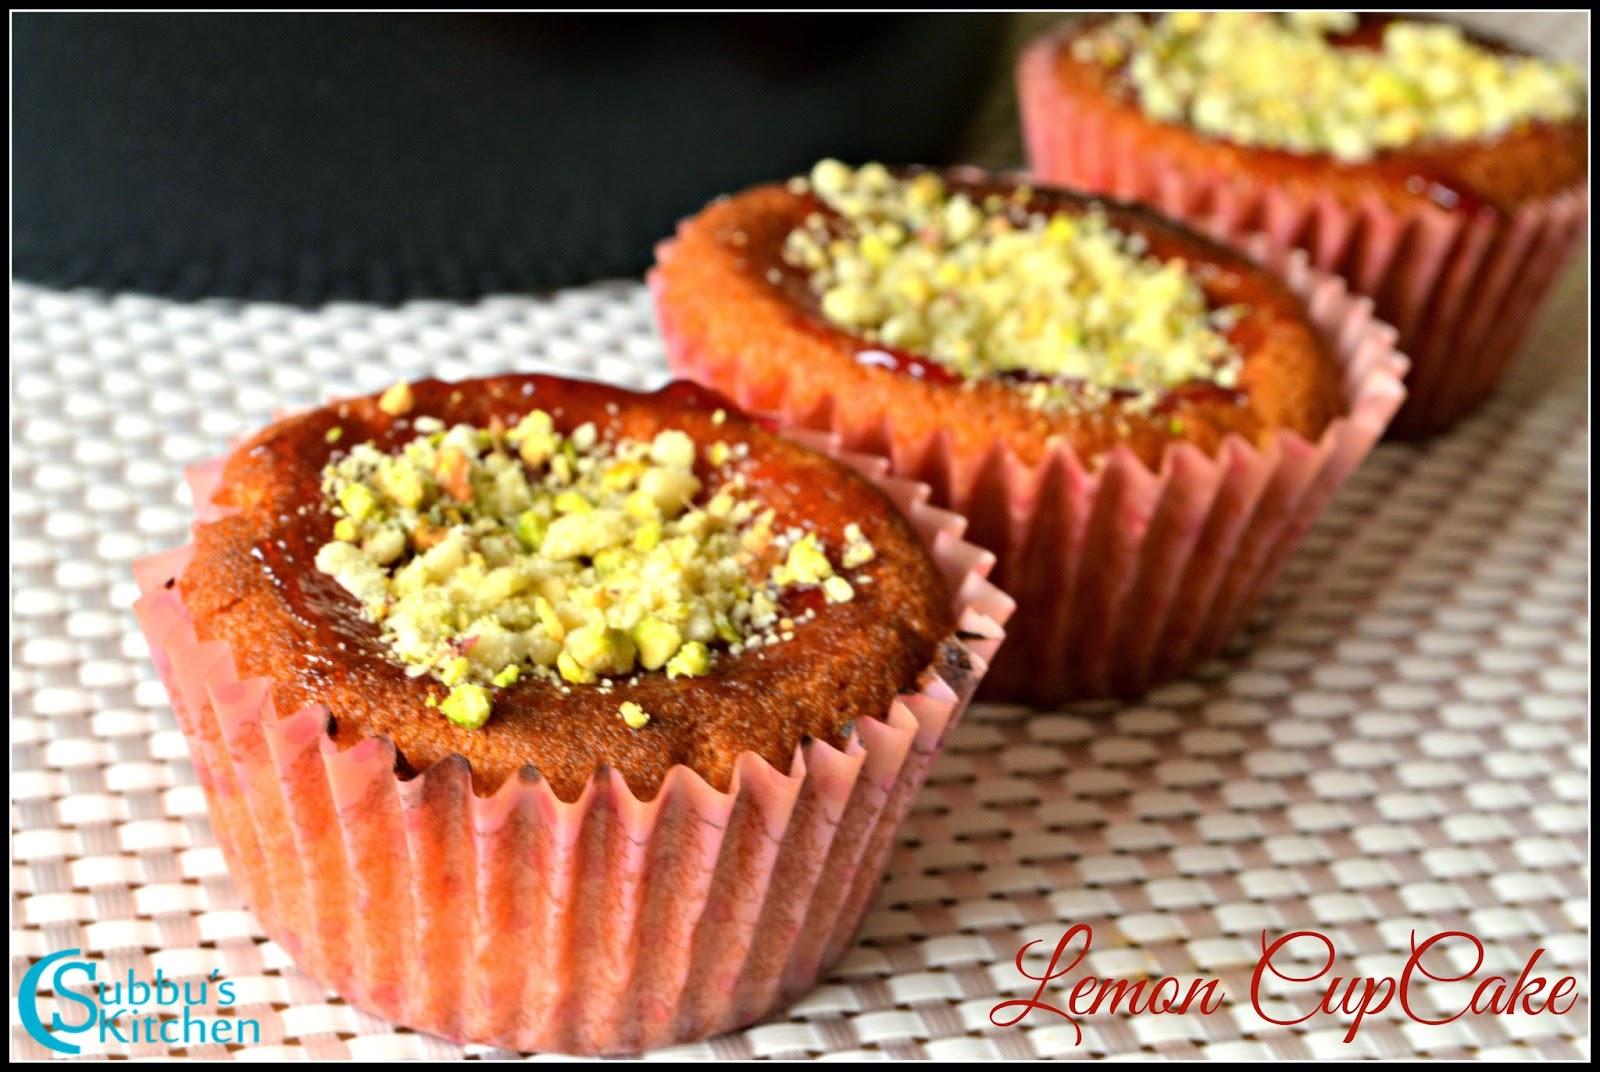 Eggless Lemon Pistachio Cup Cake Recipe